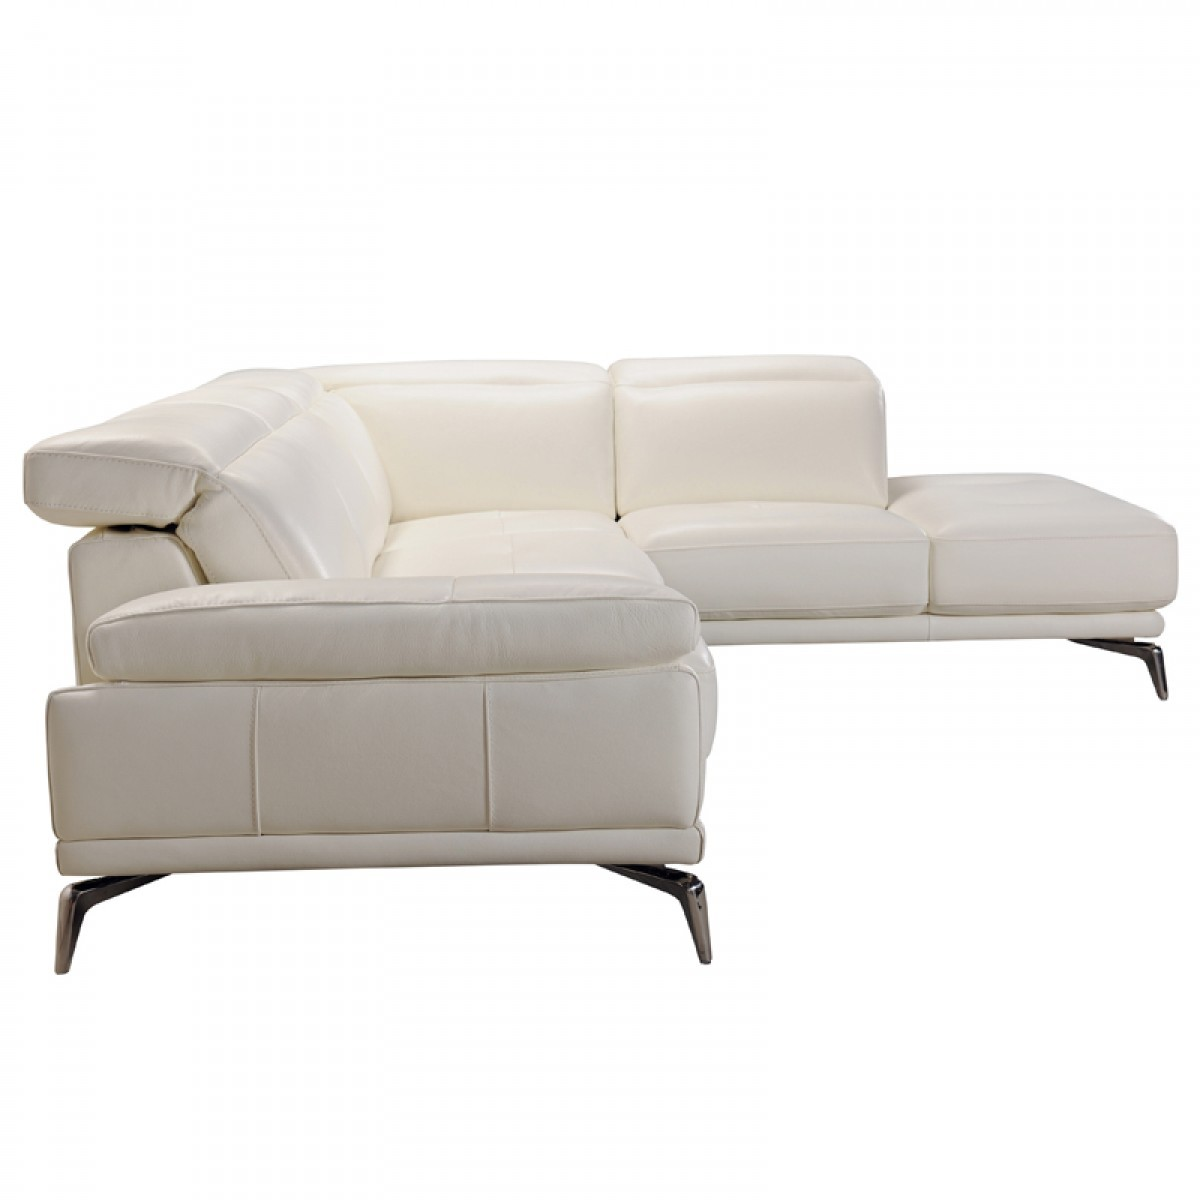 modern white italian leather sectional sofa china image divani casa tundra full